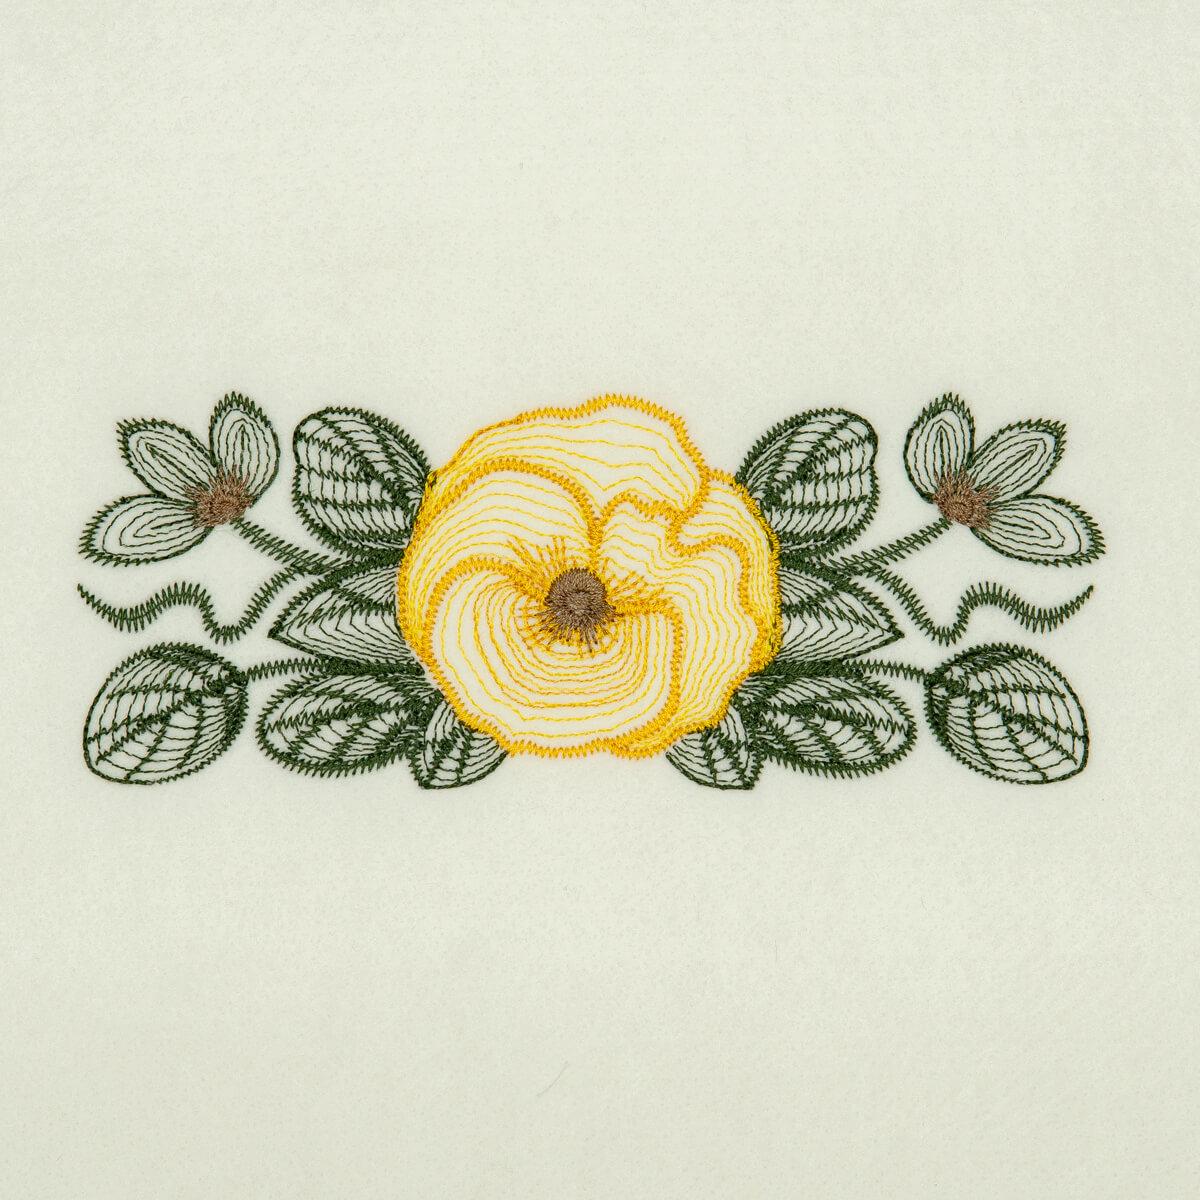 Matriz de bordado floral rippled 11